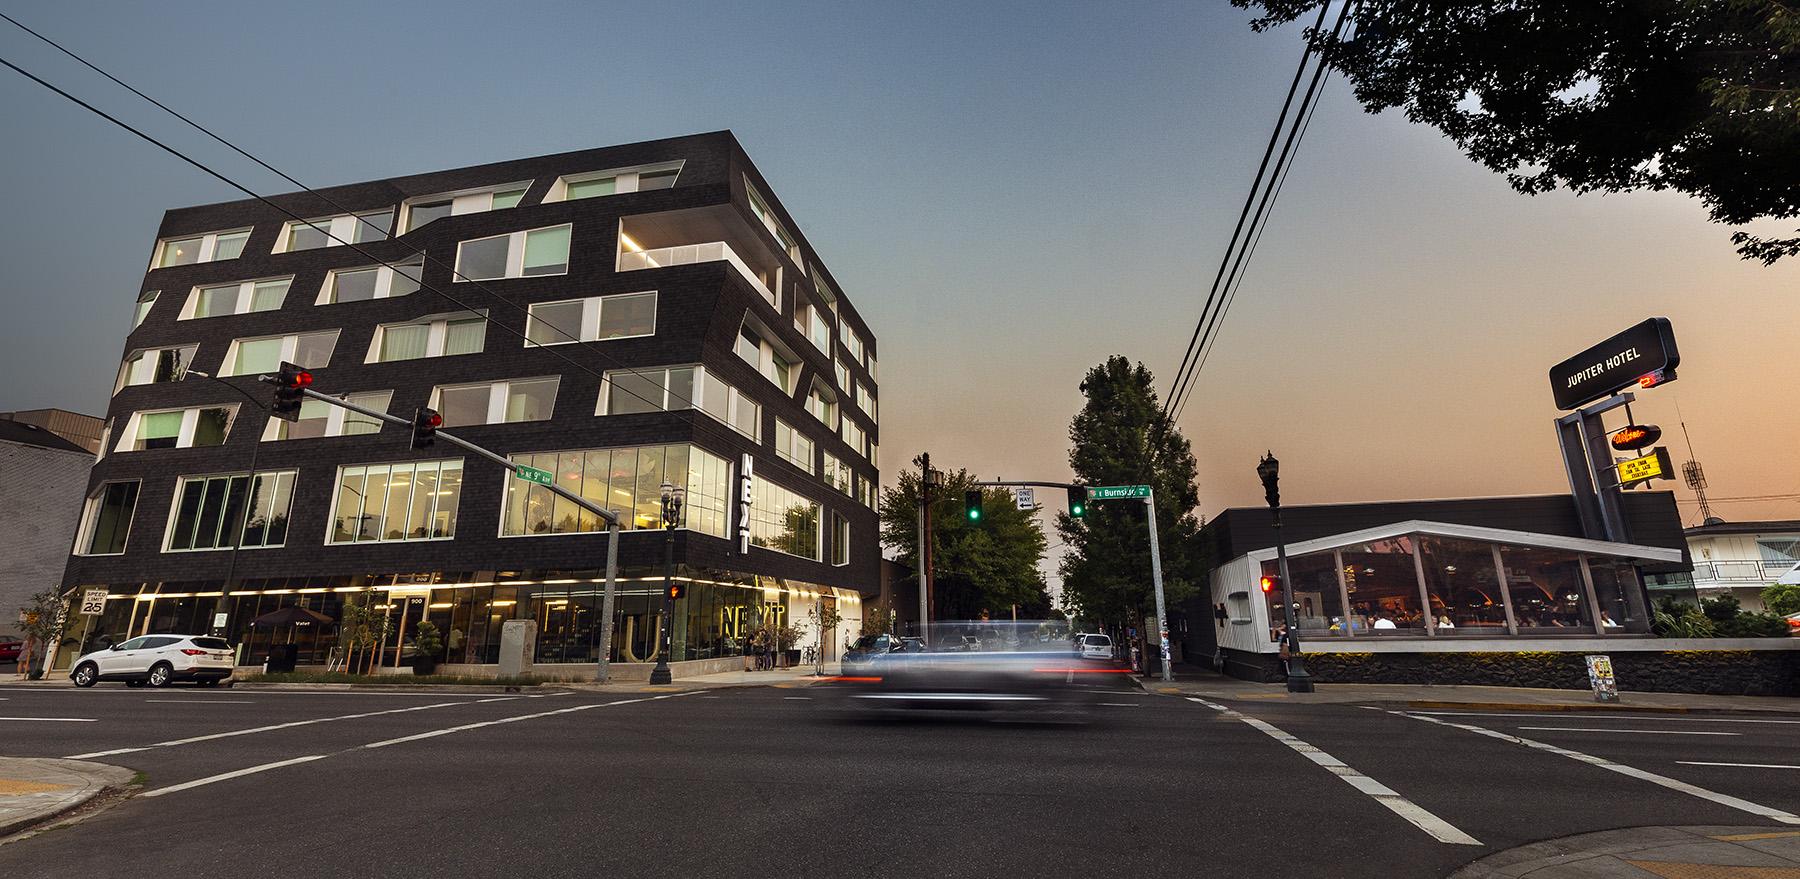 The Jupiter hotel Portland